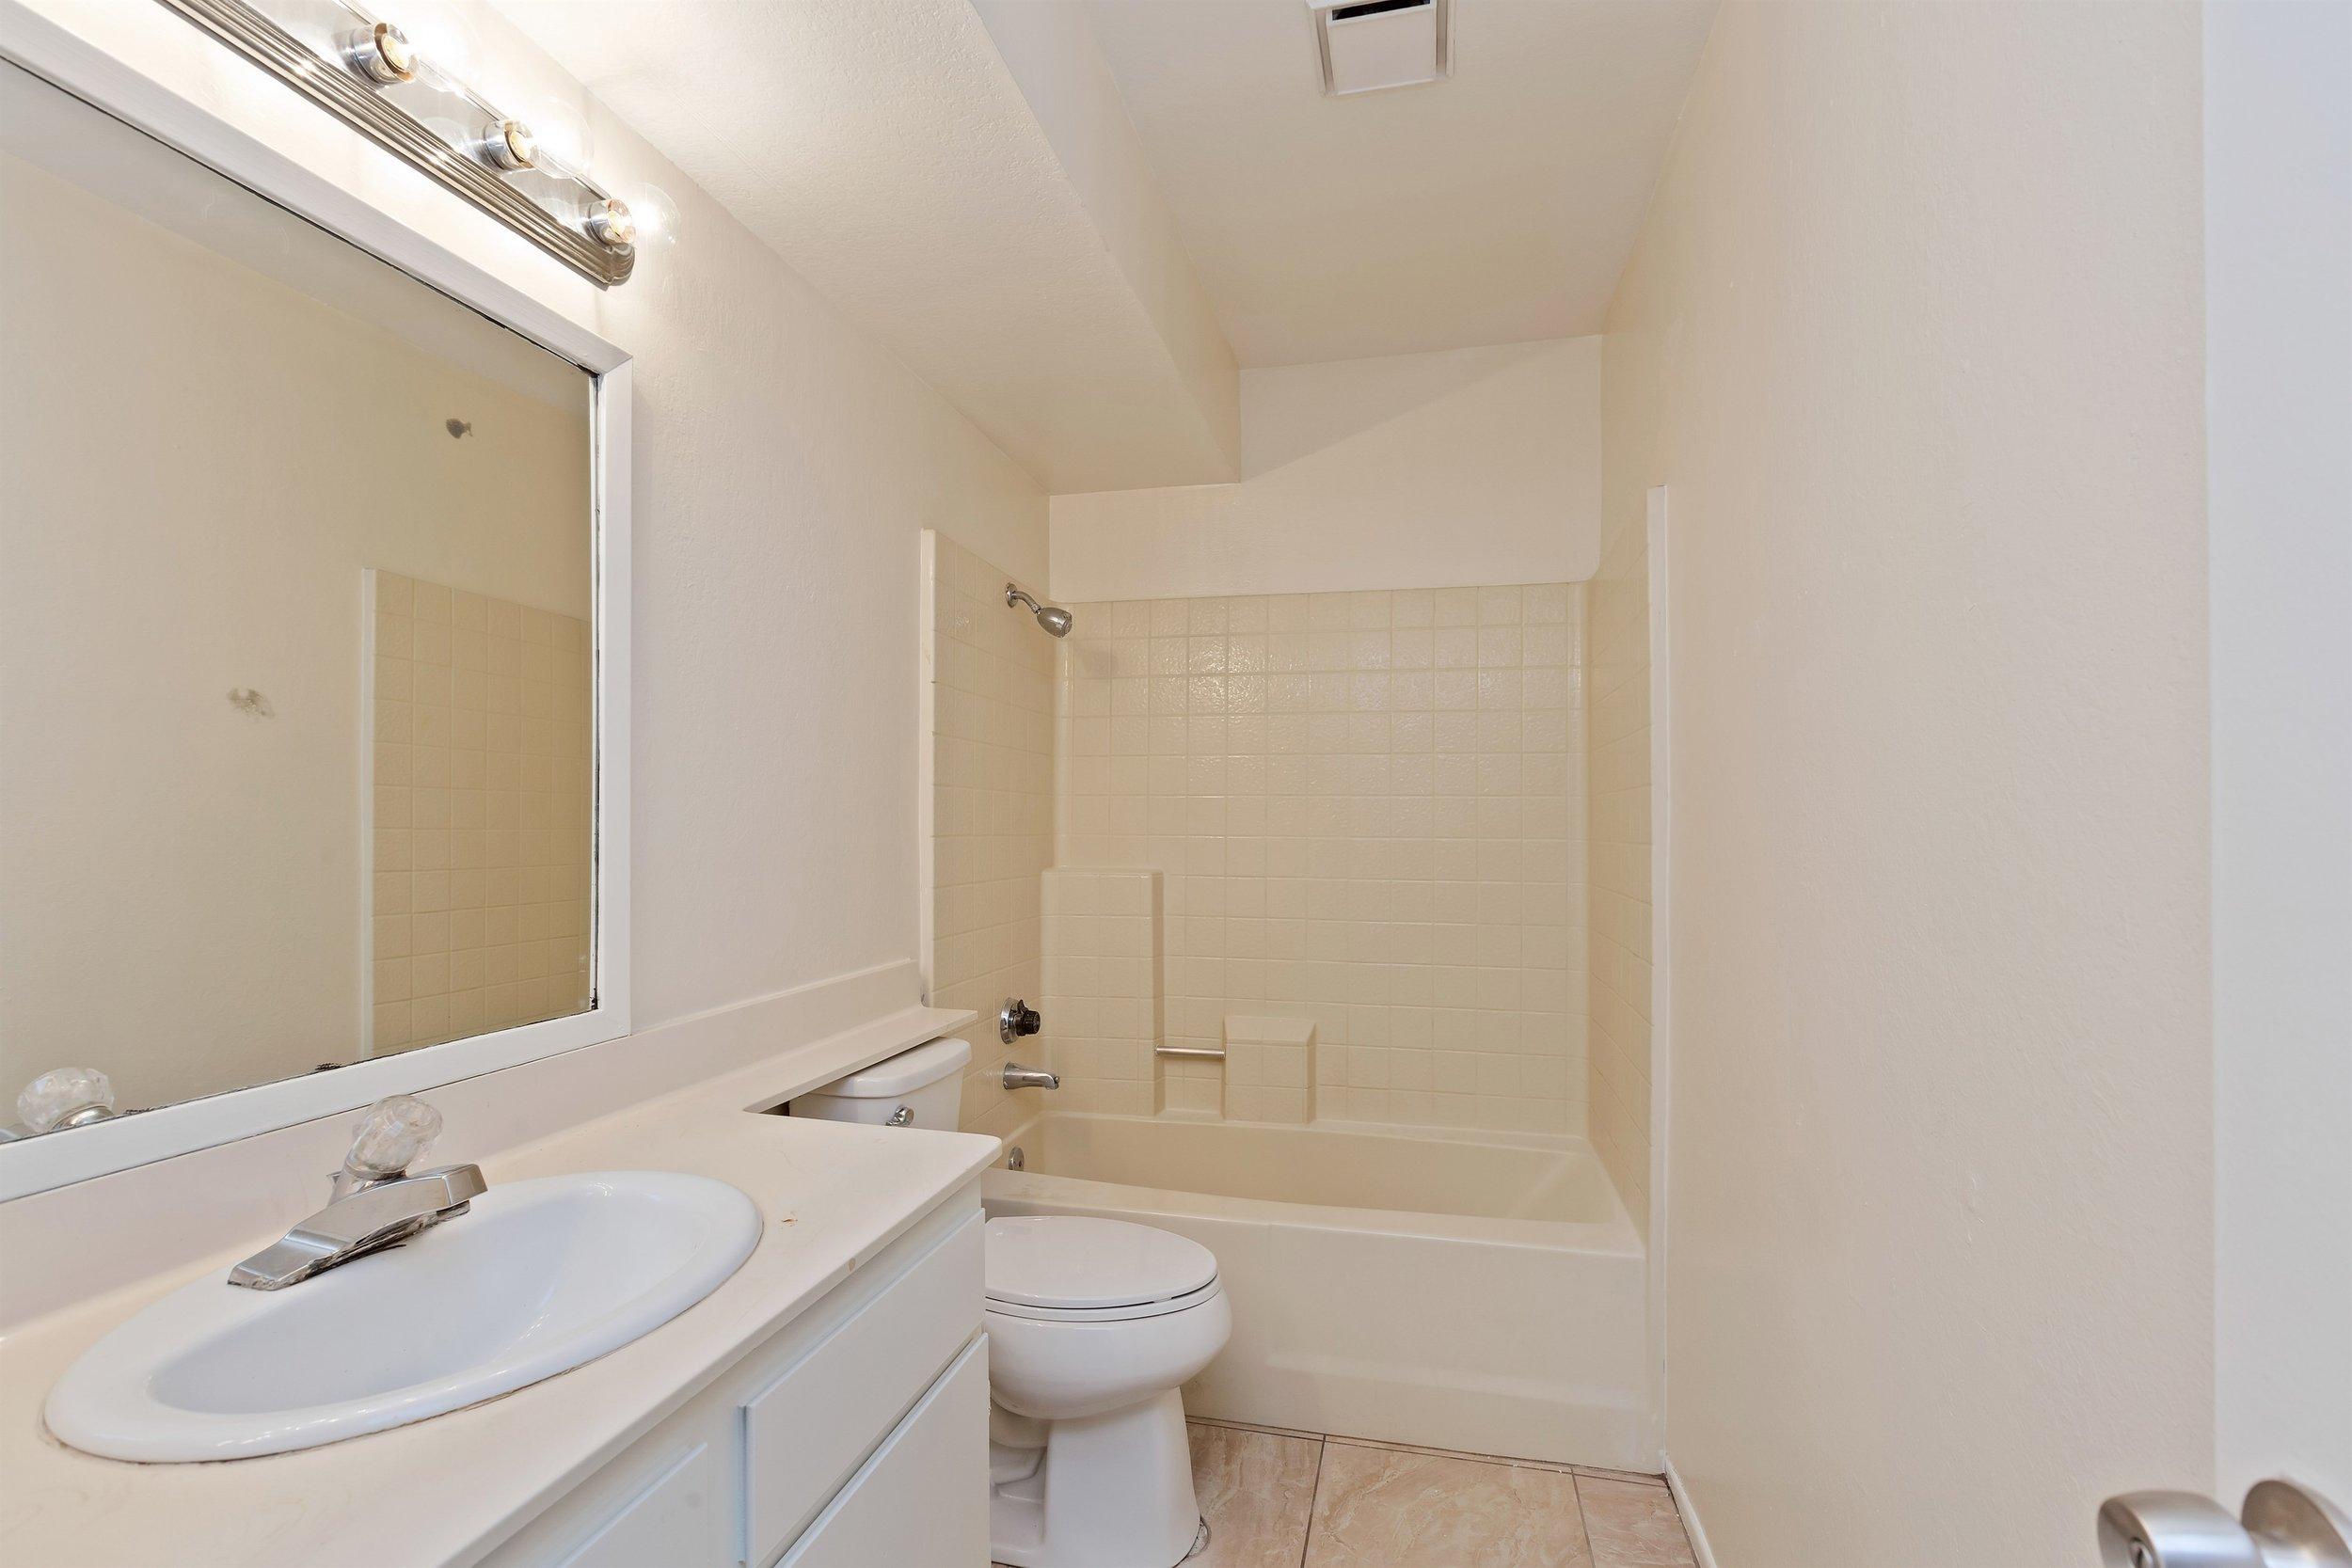 015_Bathroom .jpg